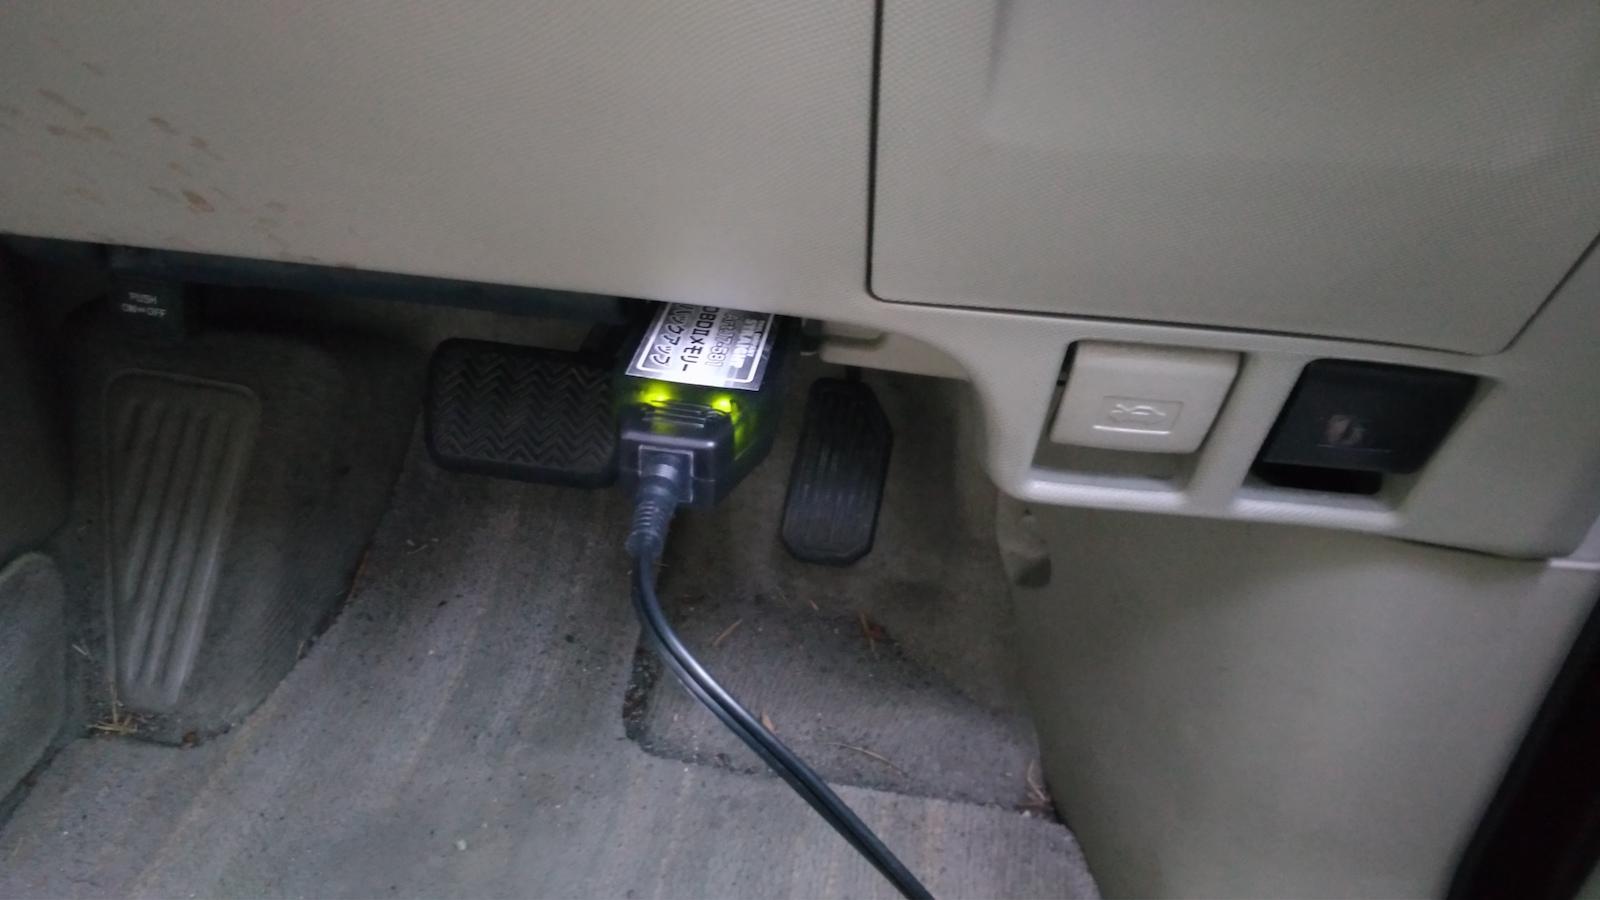 P 20180218 165104 vHDR Auto